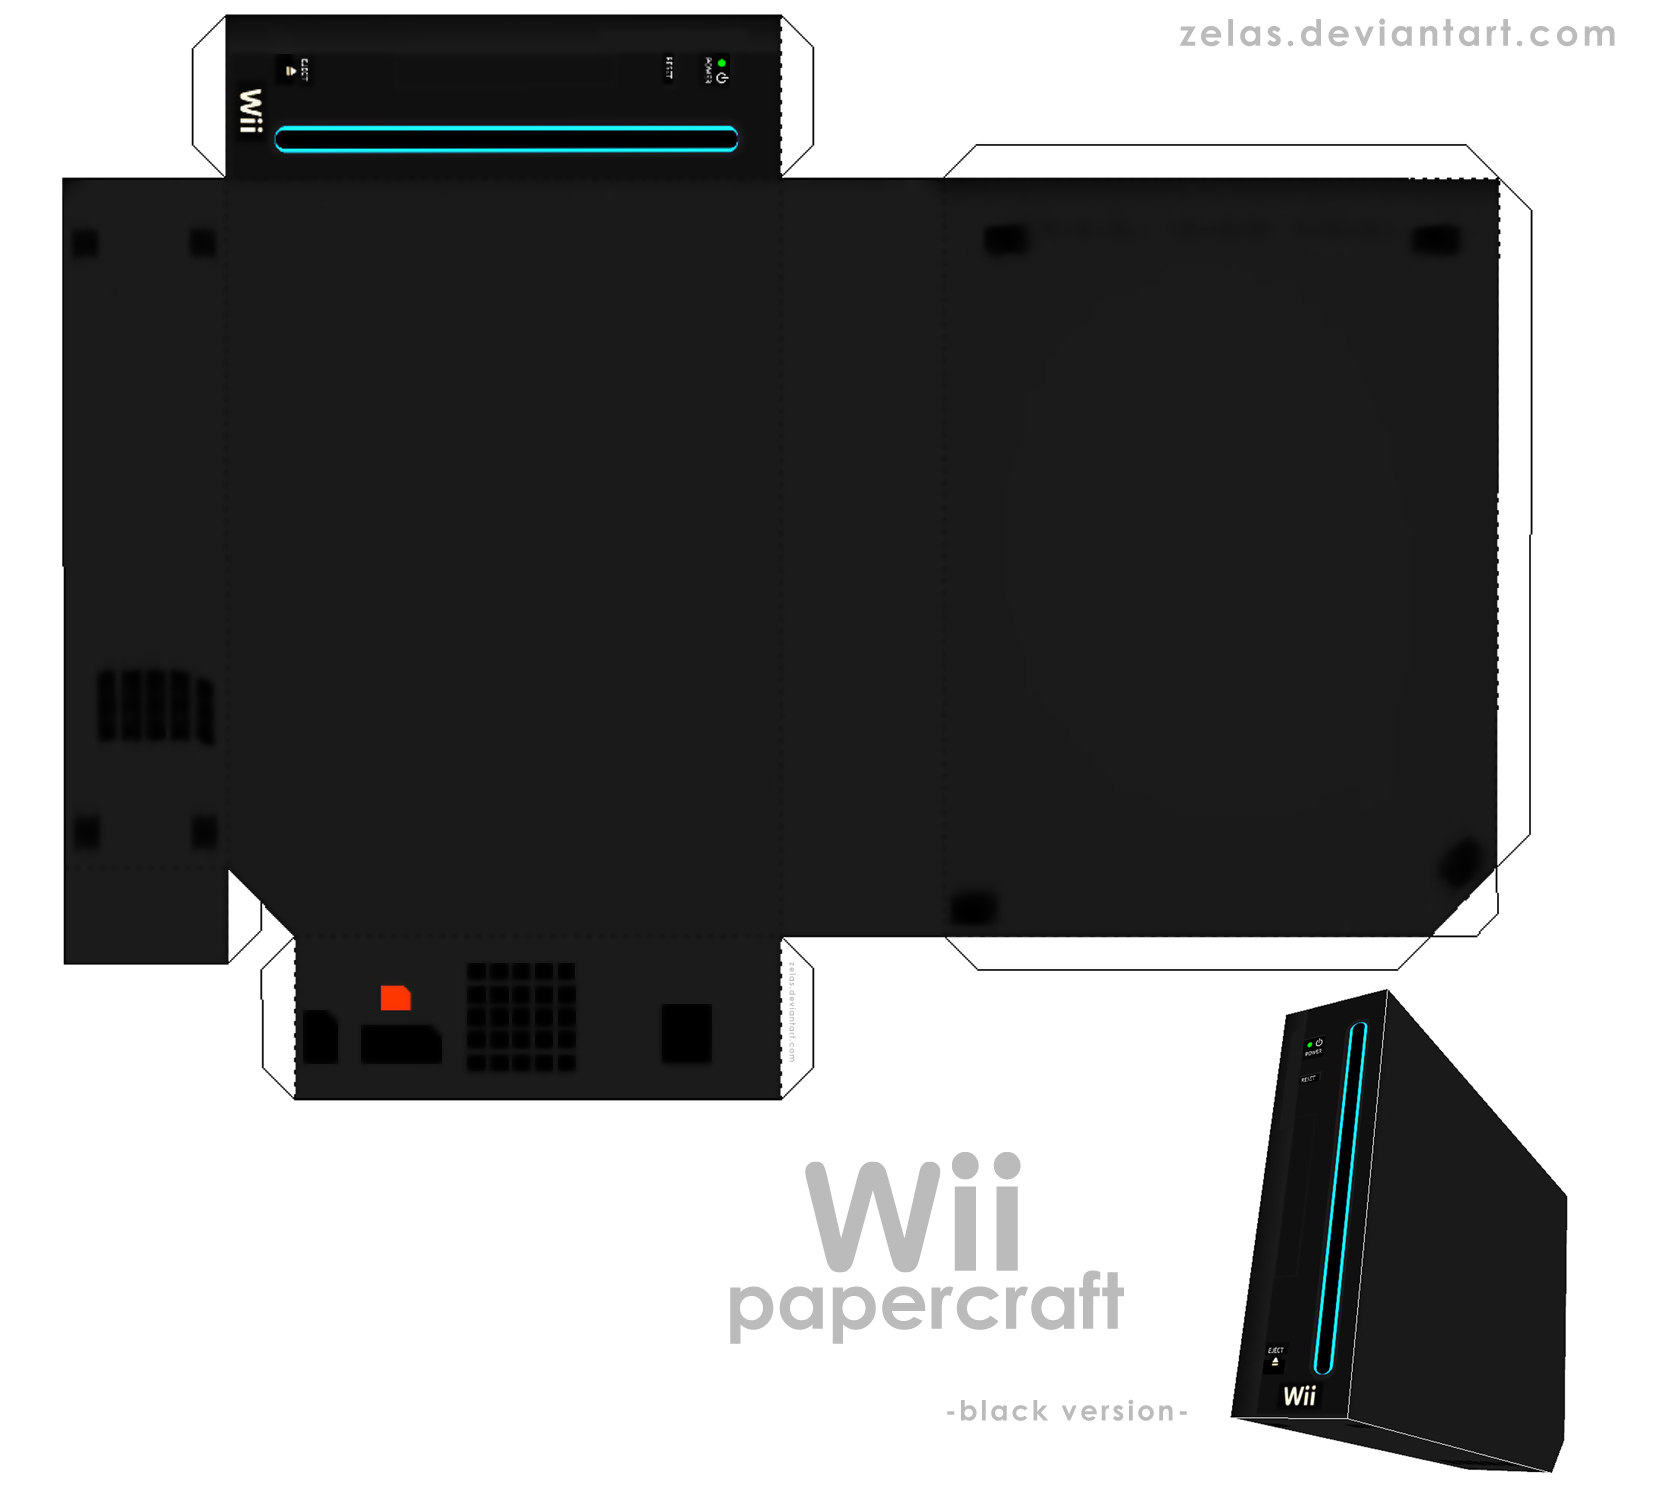 Simple black Wii - papercraft-